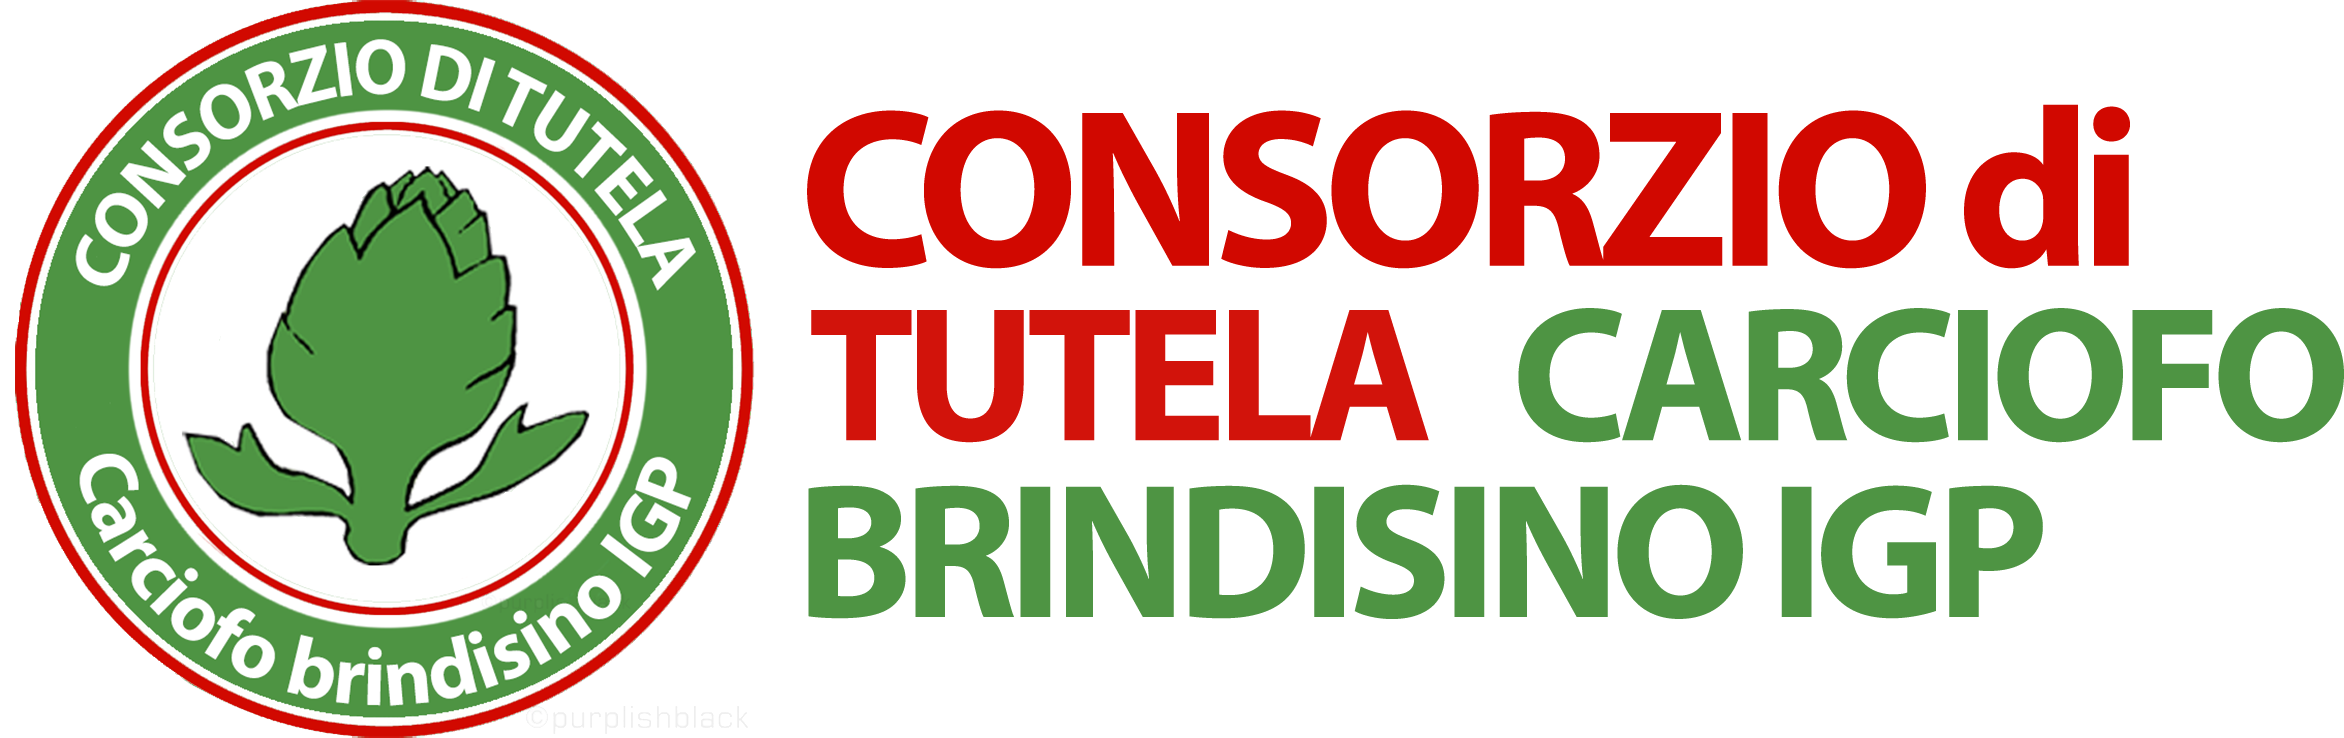 Consorzio di Tutela Carciofo Brindisino IGP